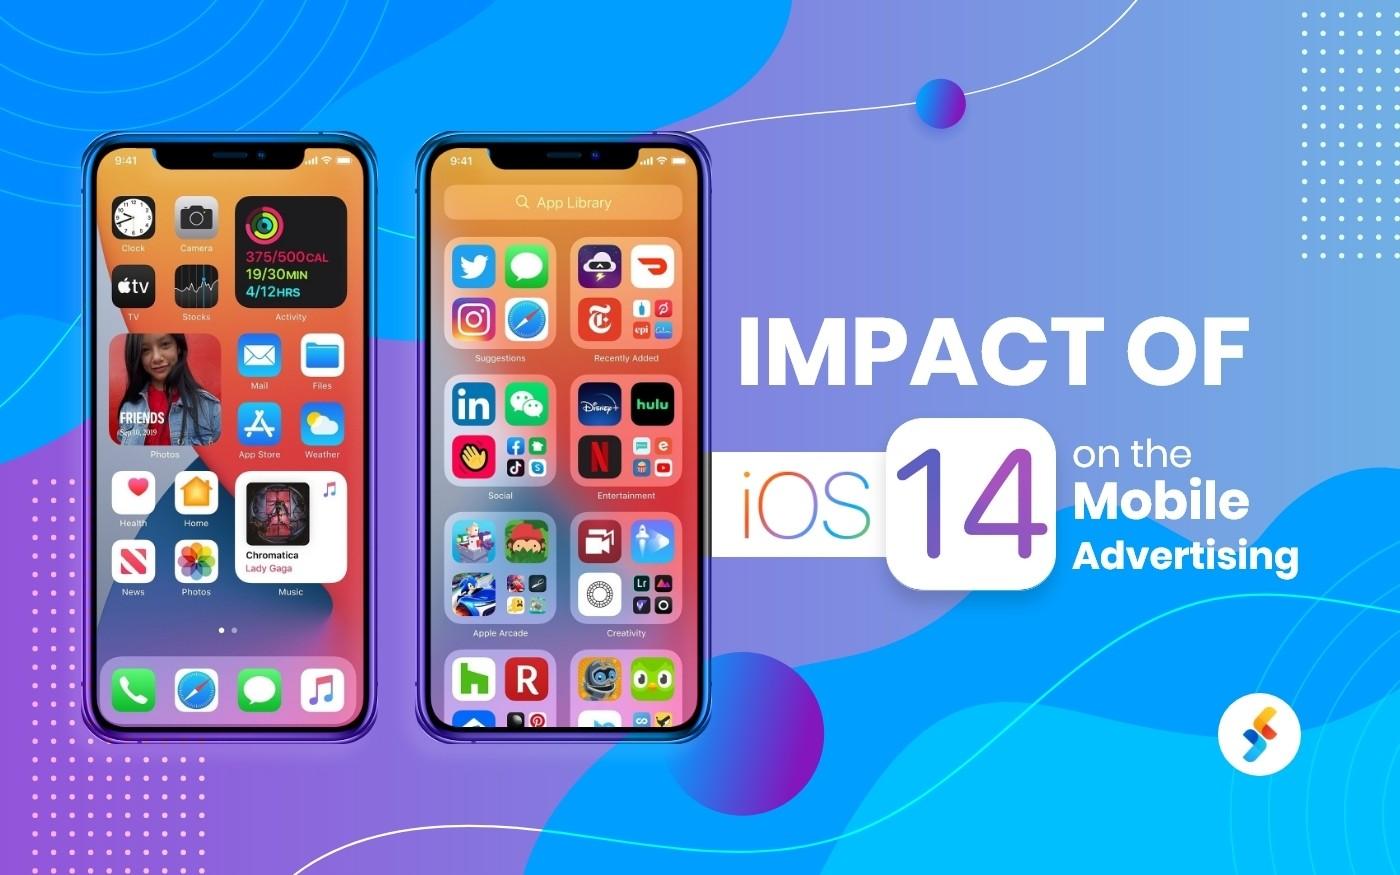 Impact of ios 14